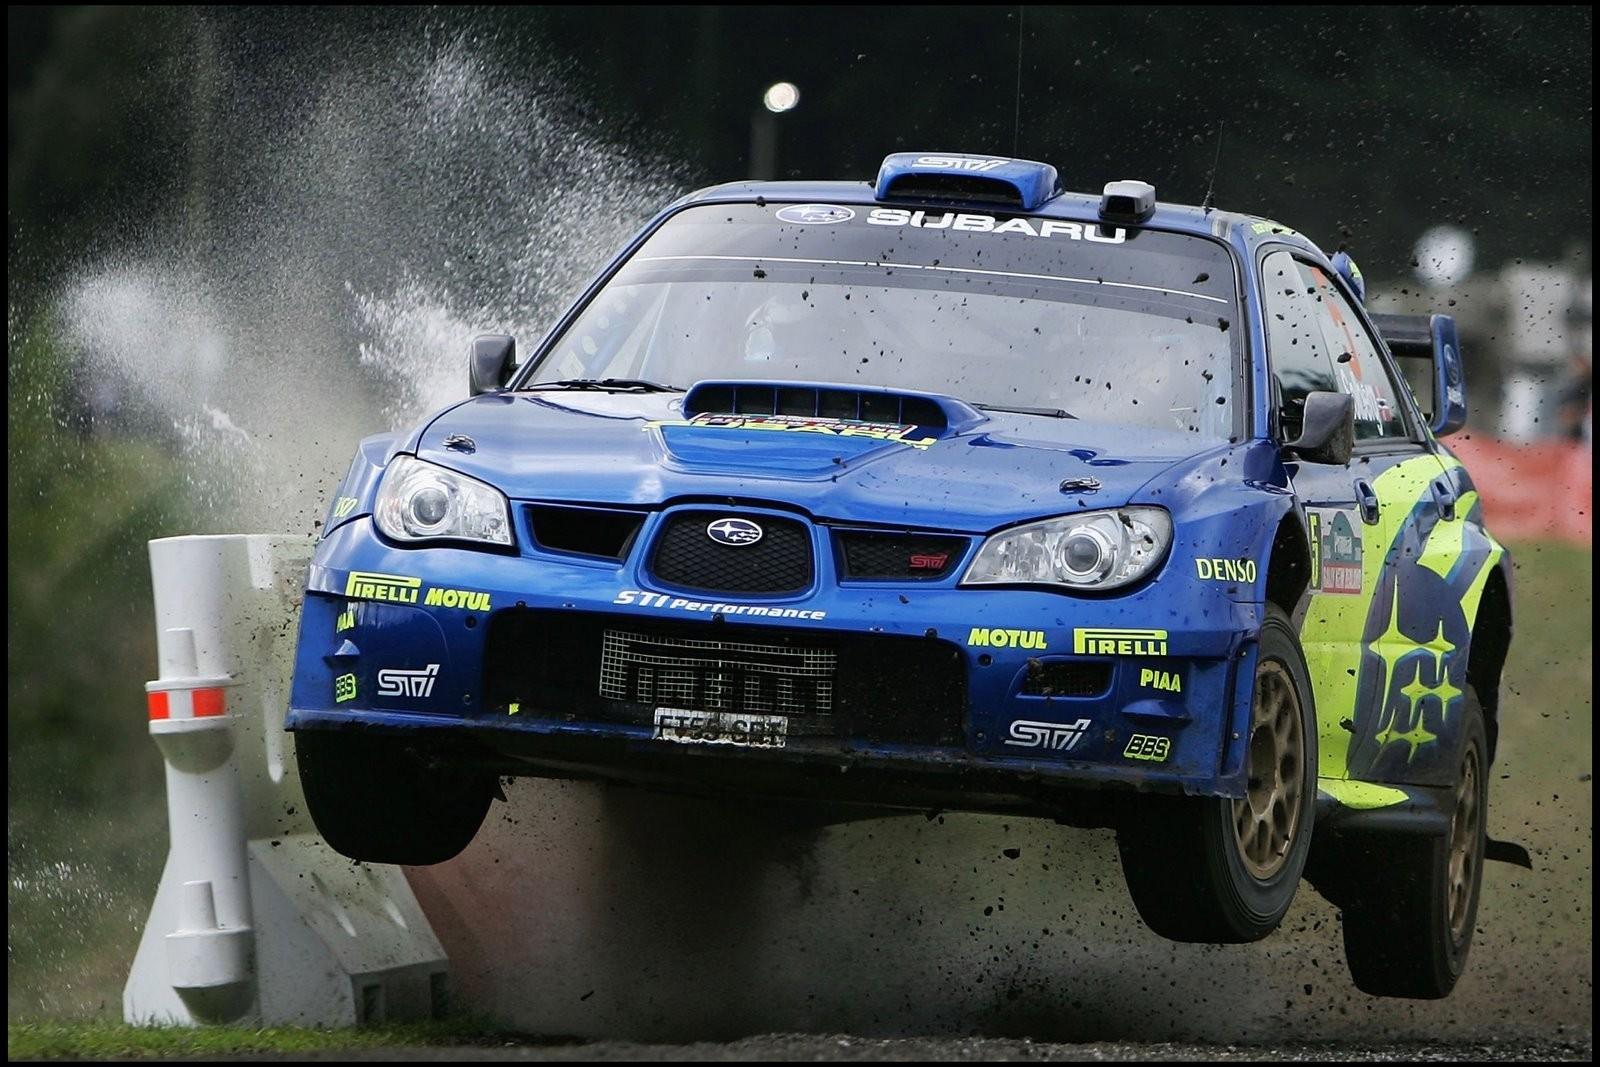 Car Subaru Rally Cars Wallpaper And Background - Wrc Racing Subaru Impreza , HD Wallpaper & Backgrounds